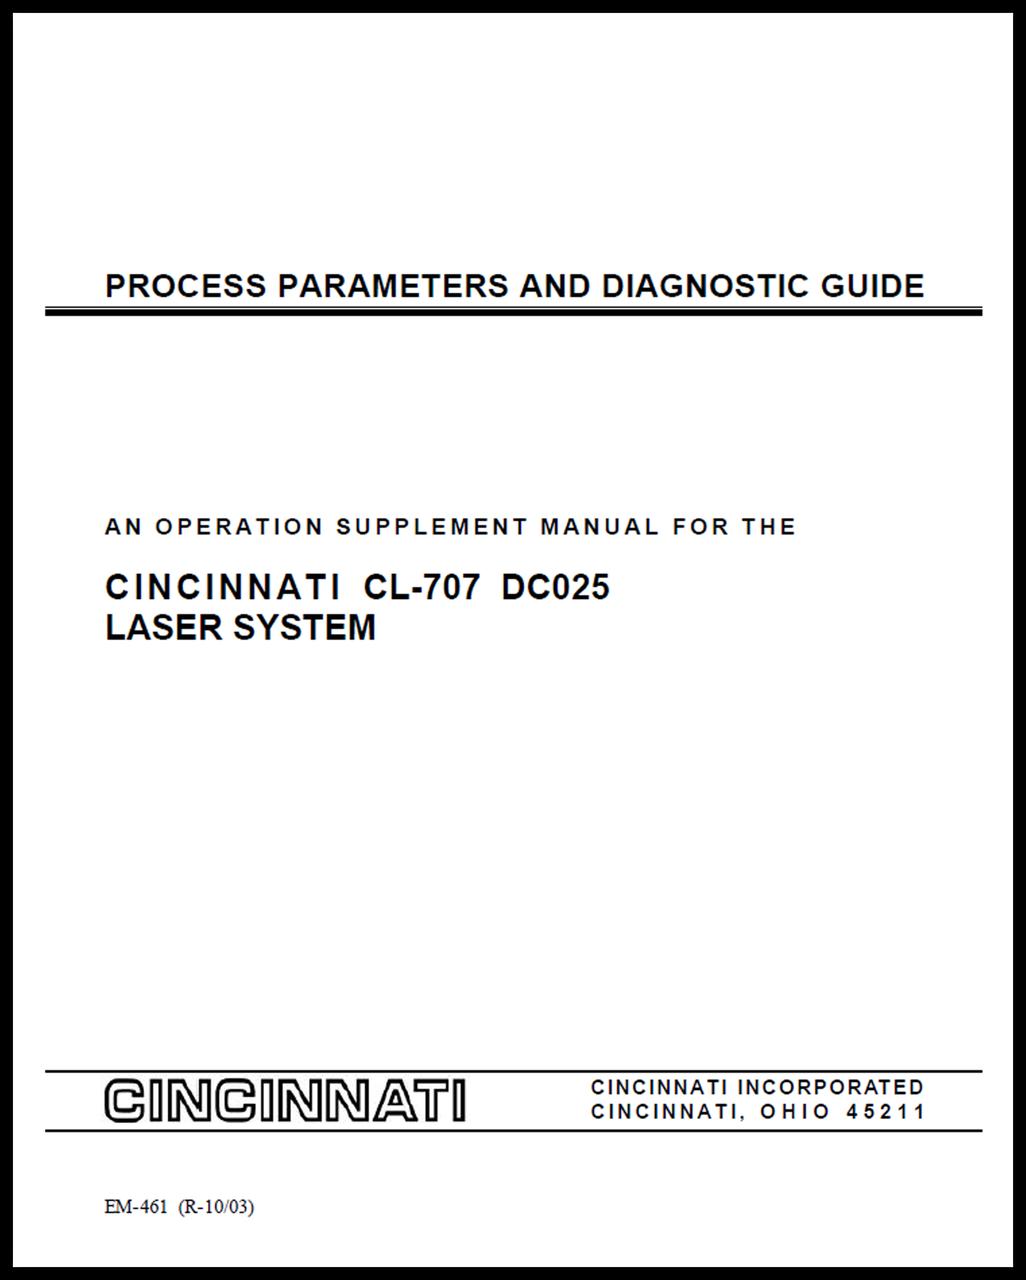 EM-461 (R-10-03)  Process Parameters & Diagnostics Guide - An Operation Supplement Manual for the CINCINNATI CL-707 DC025 Laser System